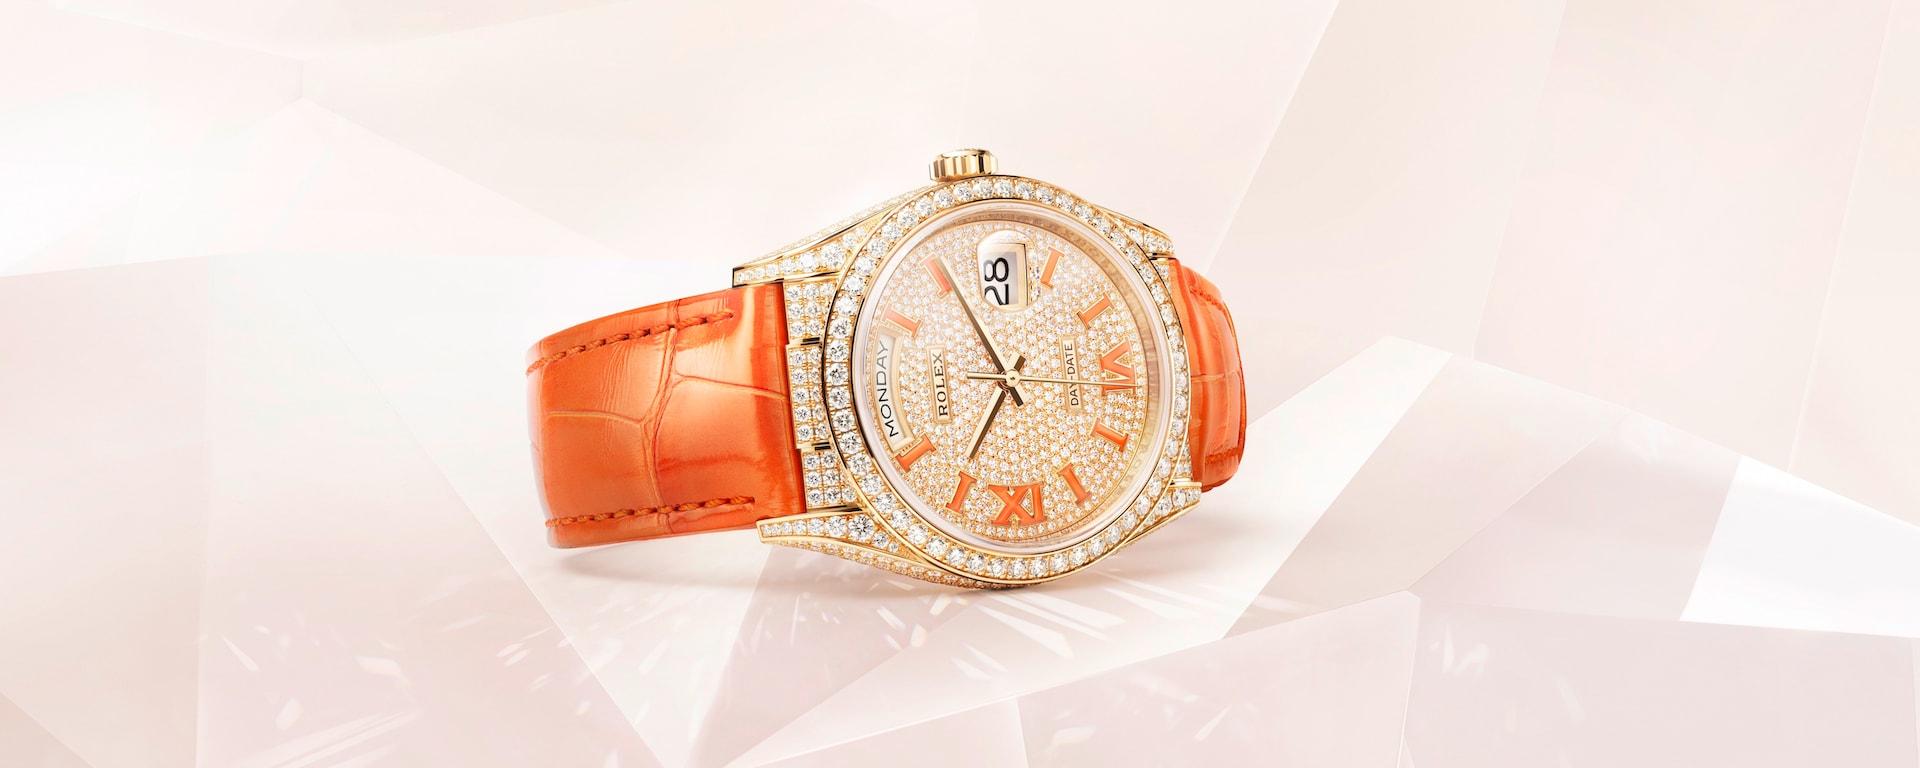 Rolex Day-Date 36mm in diamonds and bold orange.